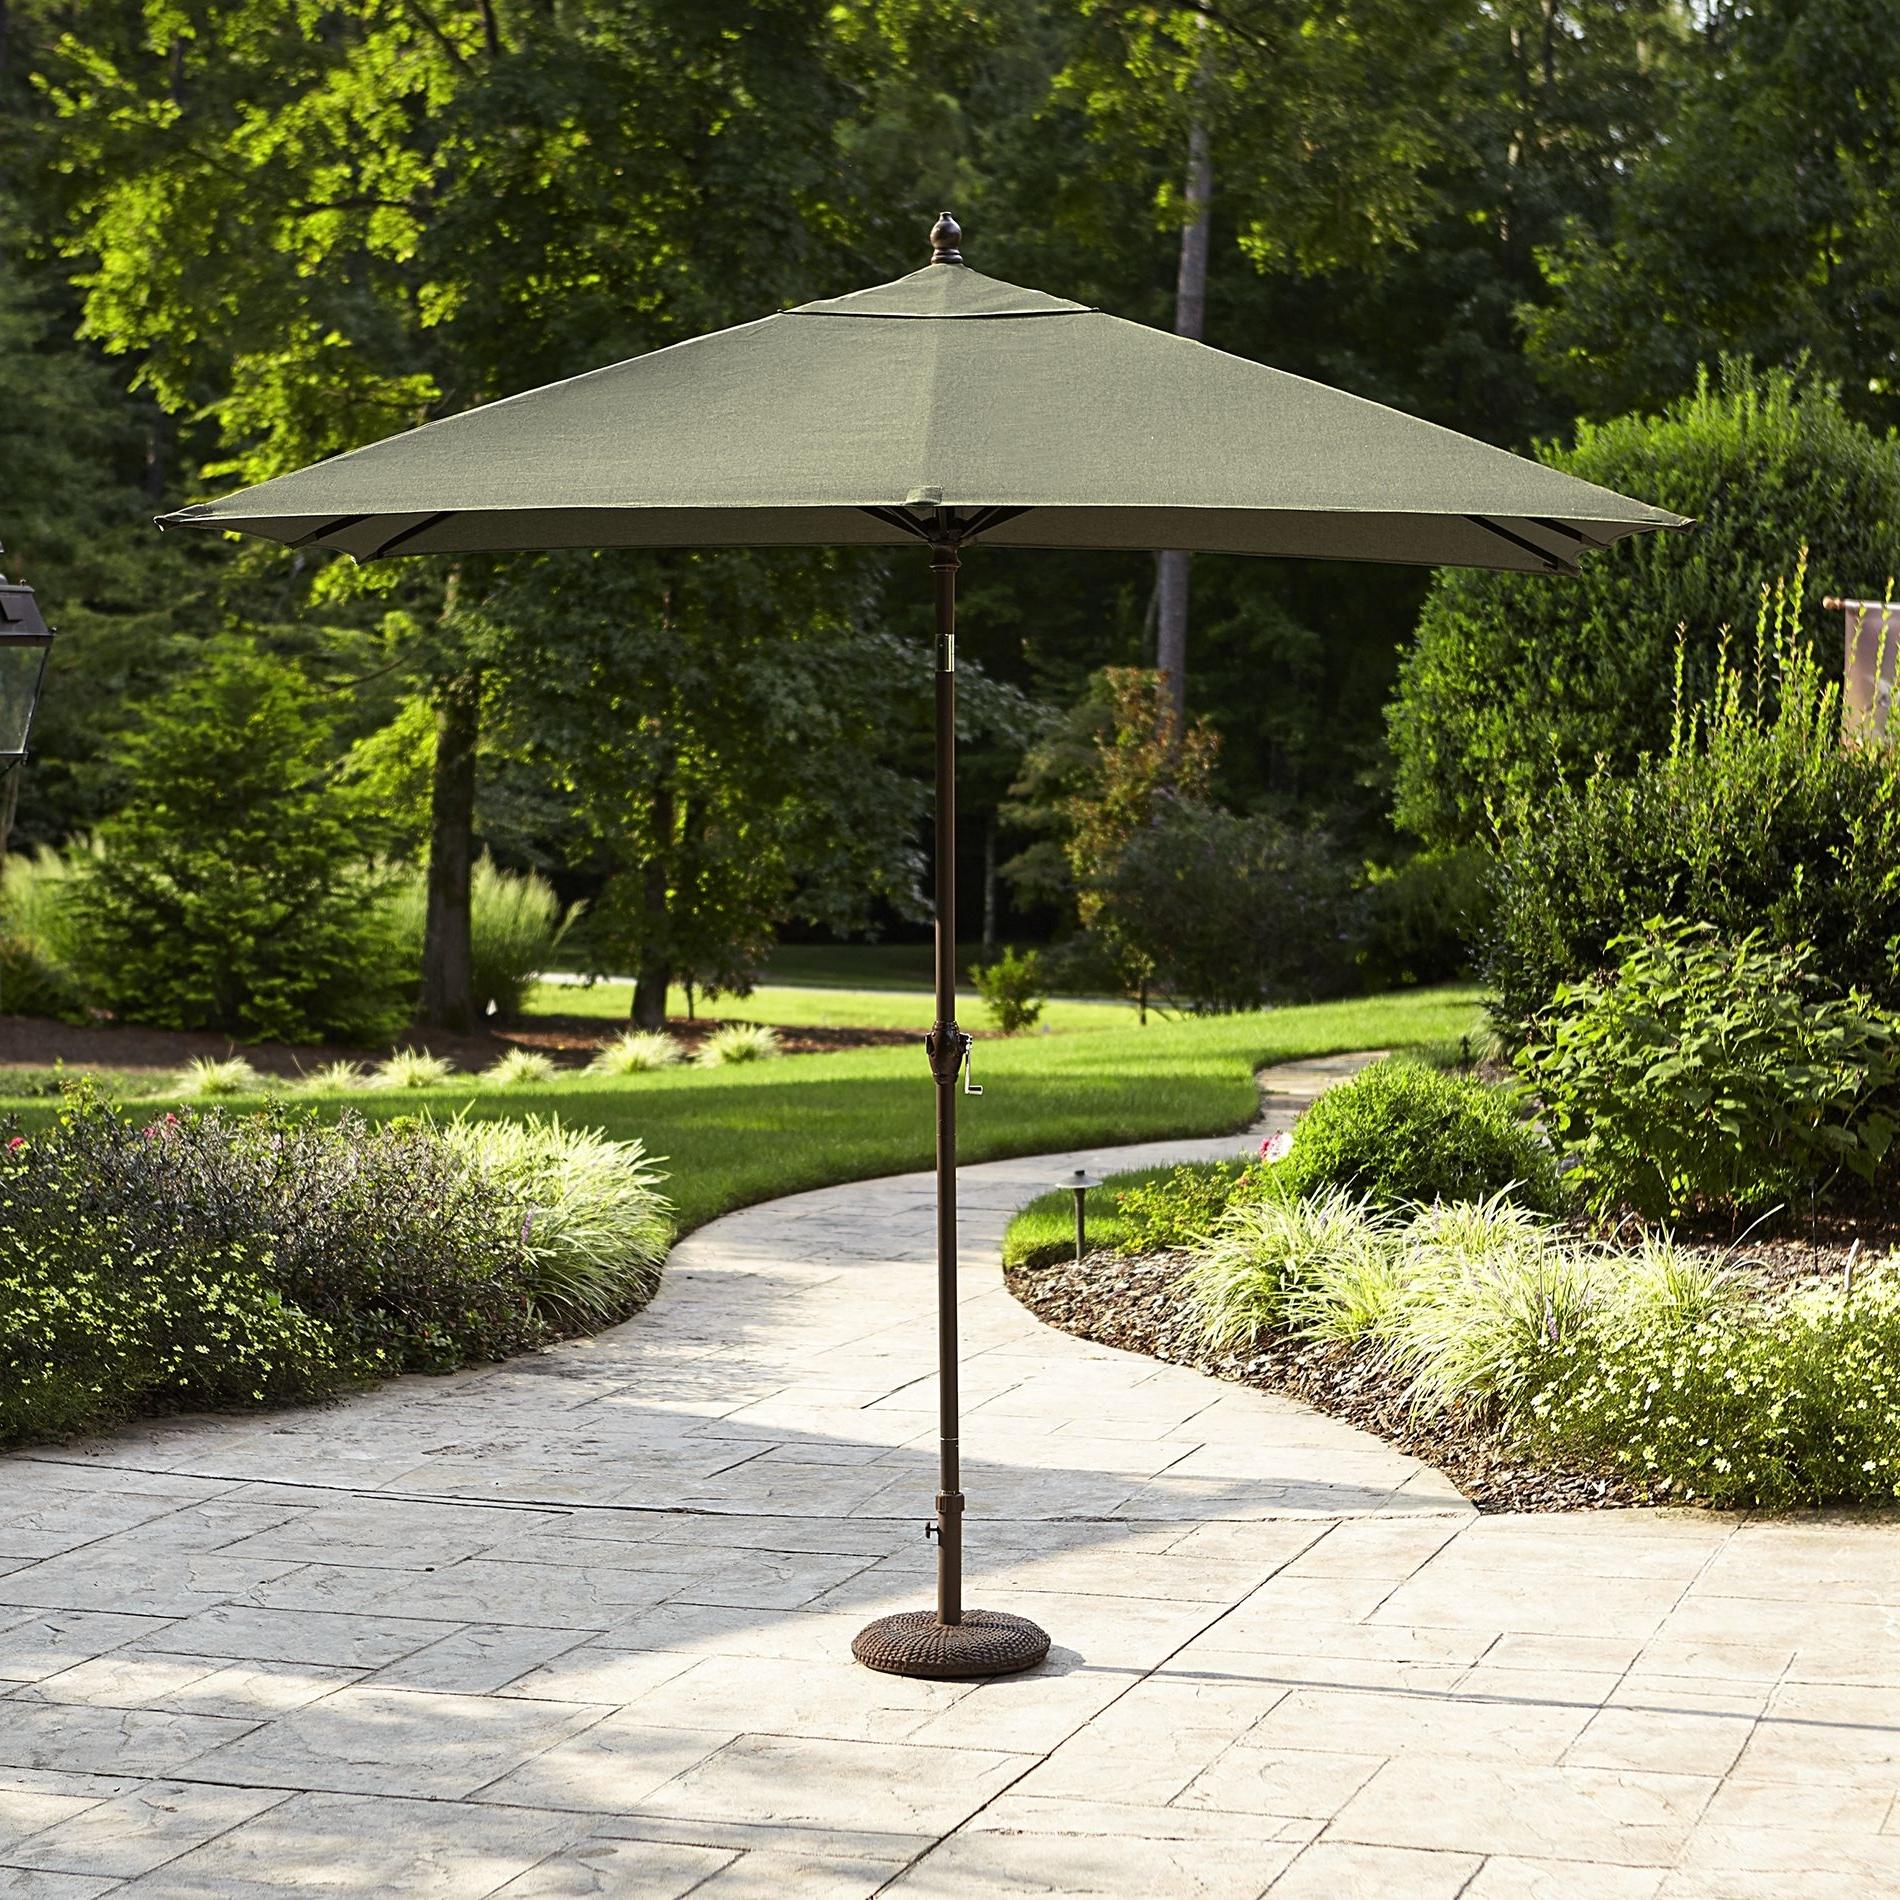 2018 Sears Patio Umbrellas Inside Sears: Green La Z Boy Madeline 9' X 6' Rectangular Patio Umbrella (View 17 of 20)